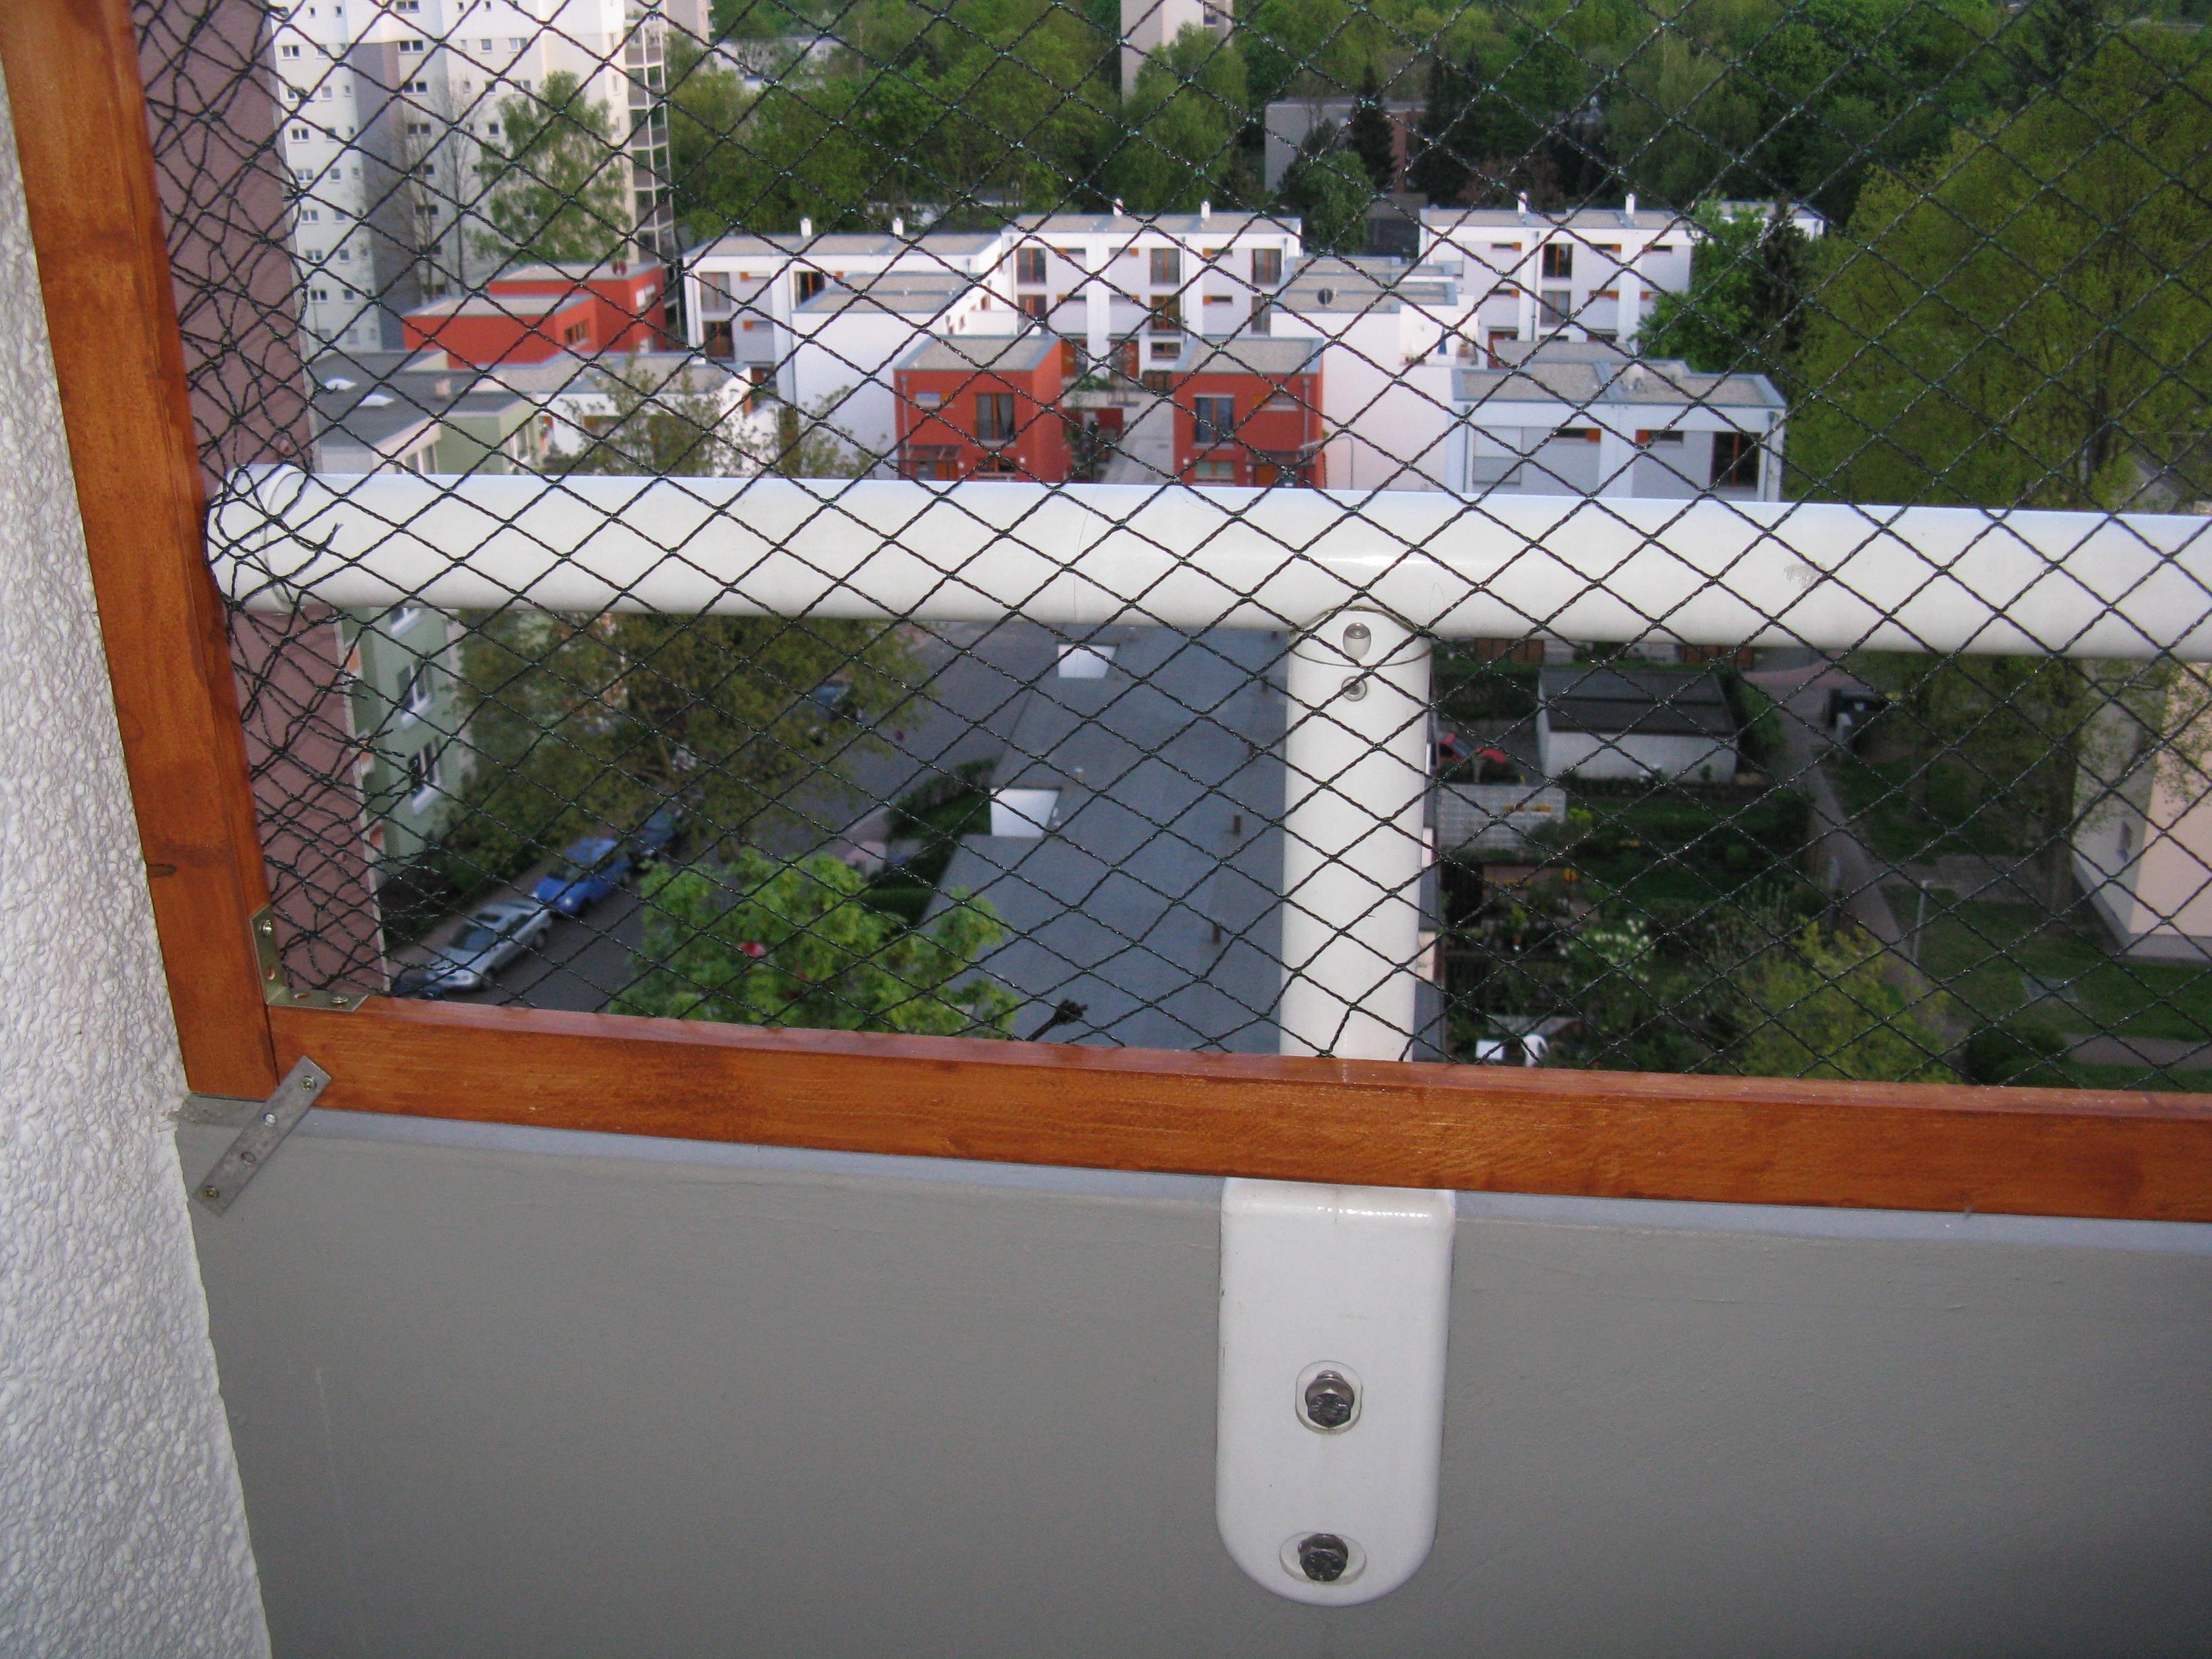 Pretty Balkon Katzennetz Images Balkon Mit Katzennetz Absichern